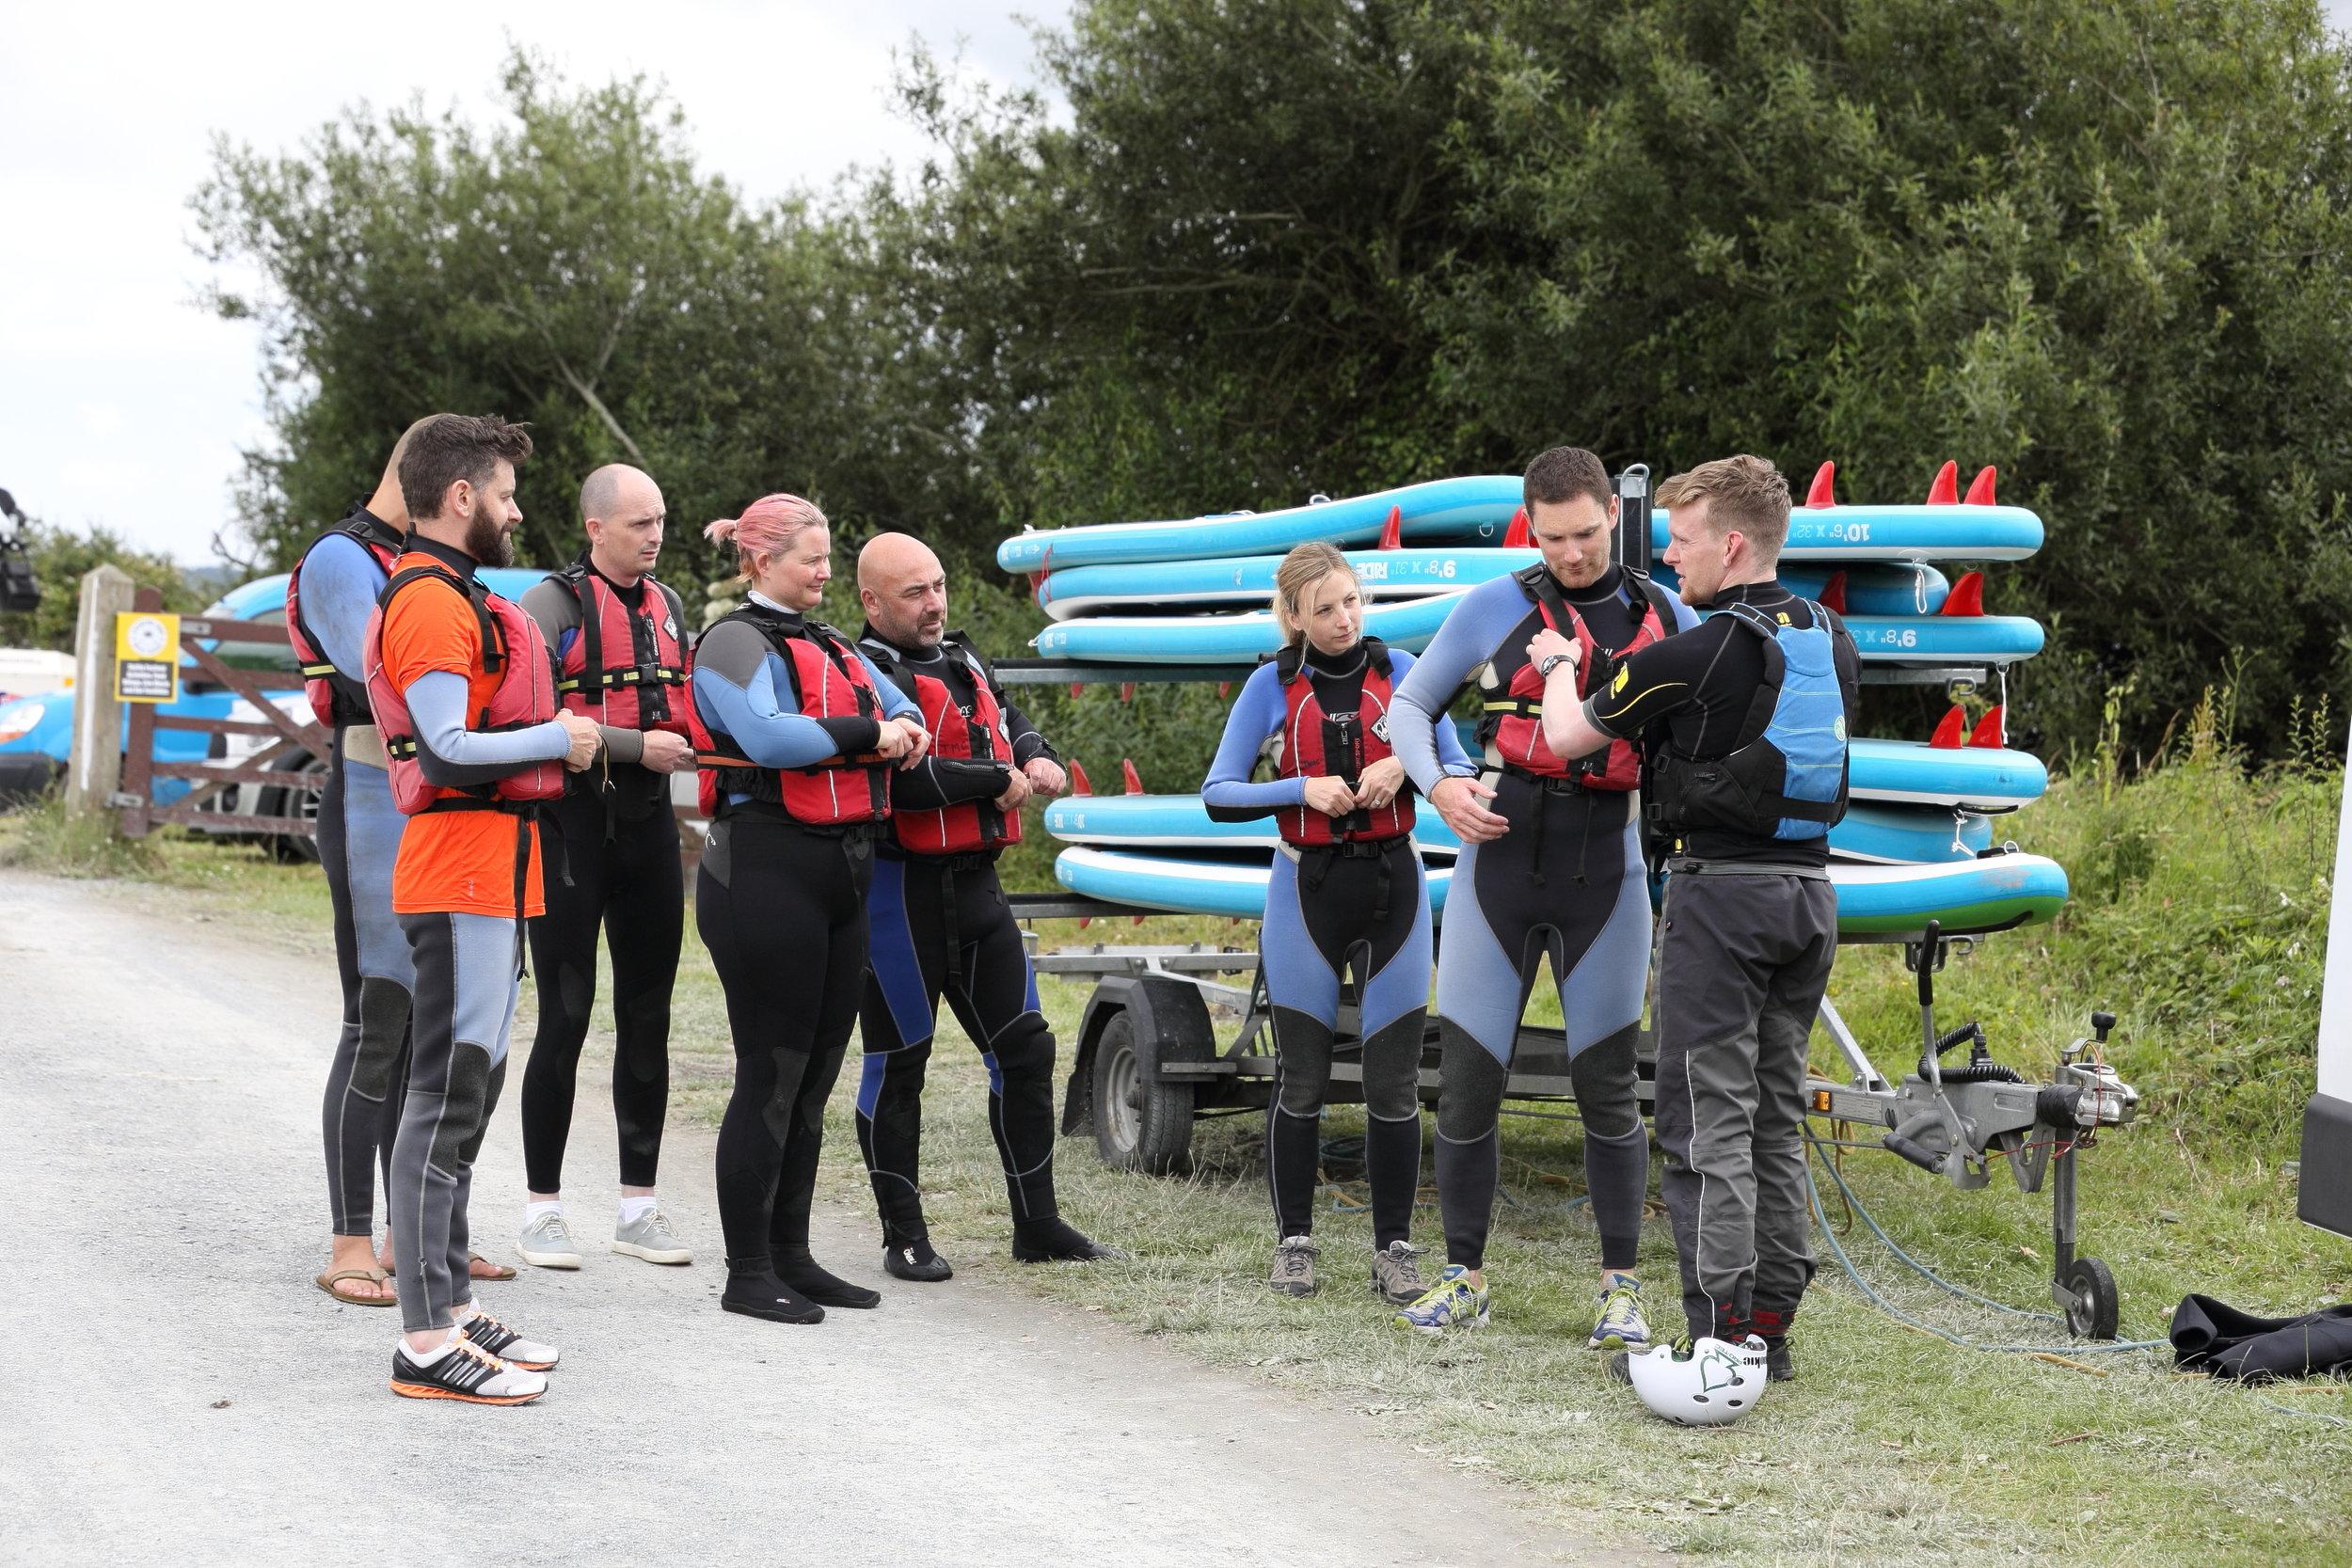 paddle_boarding_skiffiefest_ni_explorer_niexplorer_newry_mourne_northern_ireland